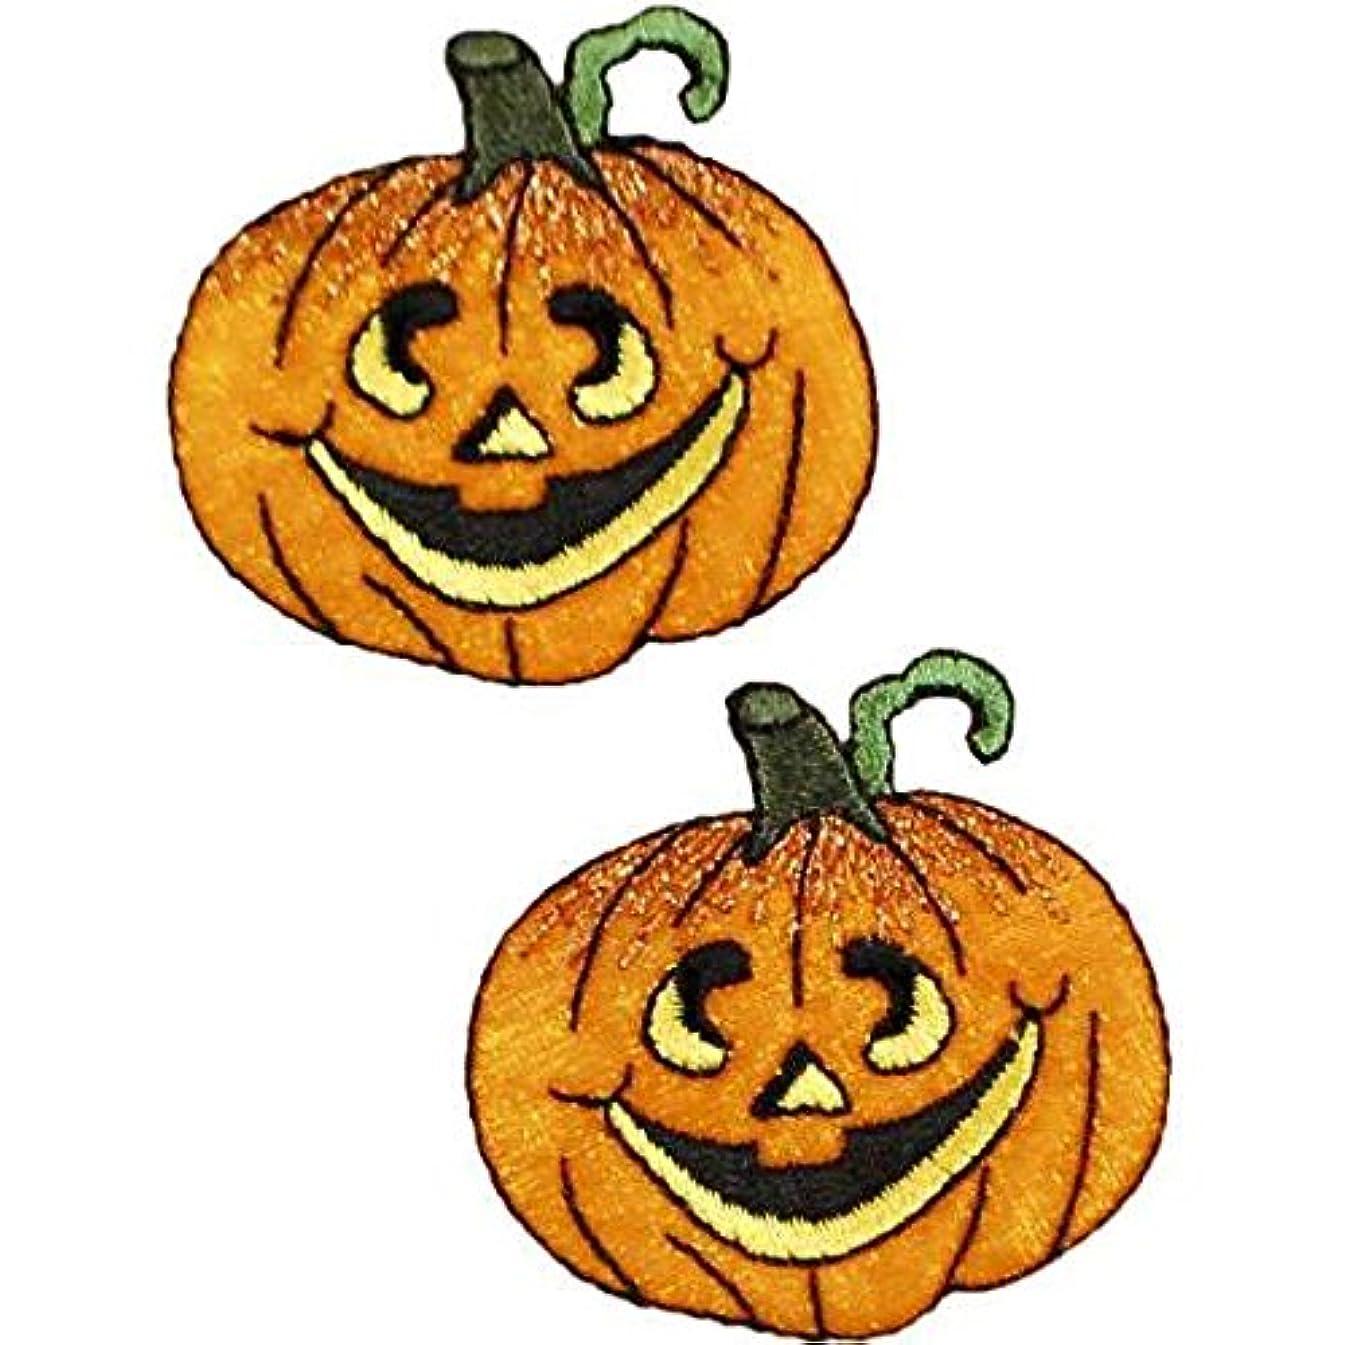 Expo International Halloween Jack-O-Lantern Iron-on Applique Trim Embellishment, Multi-Color, 2-Pack